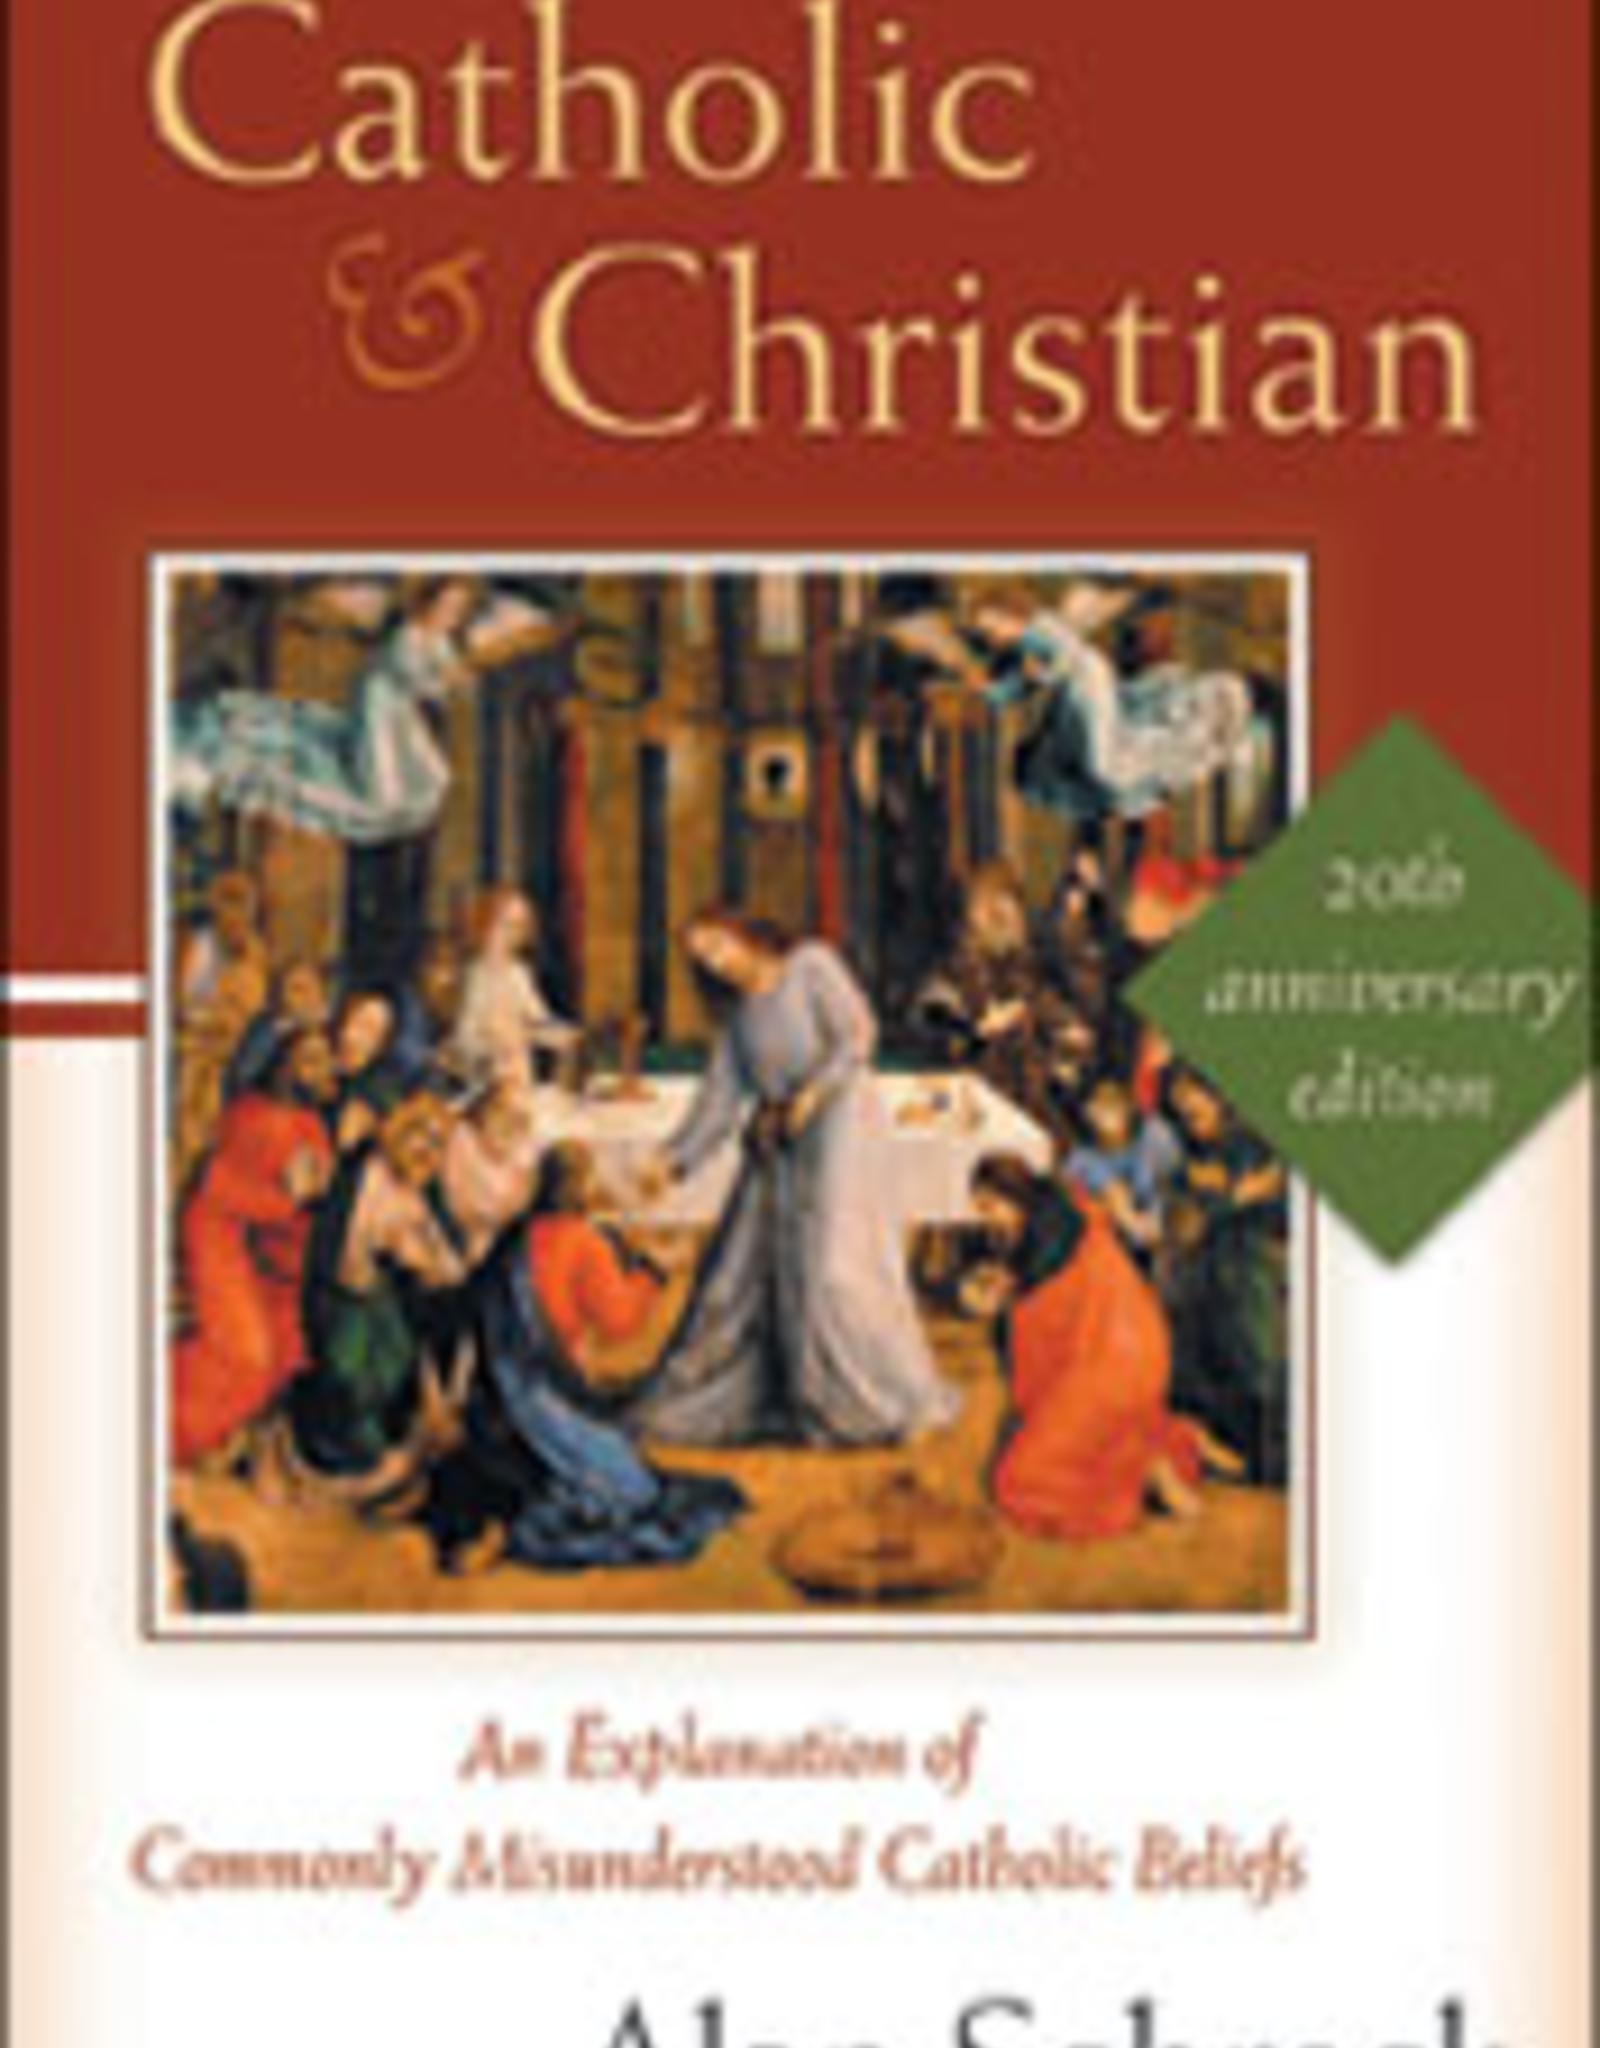 Franciscan Media Catholic & Christian:  An Explanation of Commonly Misundertstood Catholic Beliefs, by Alan Schreck (paperback)